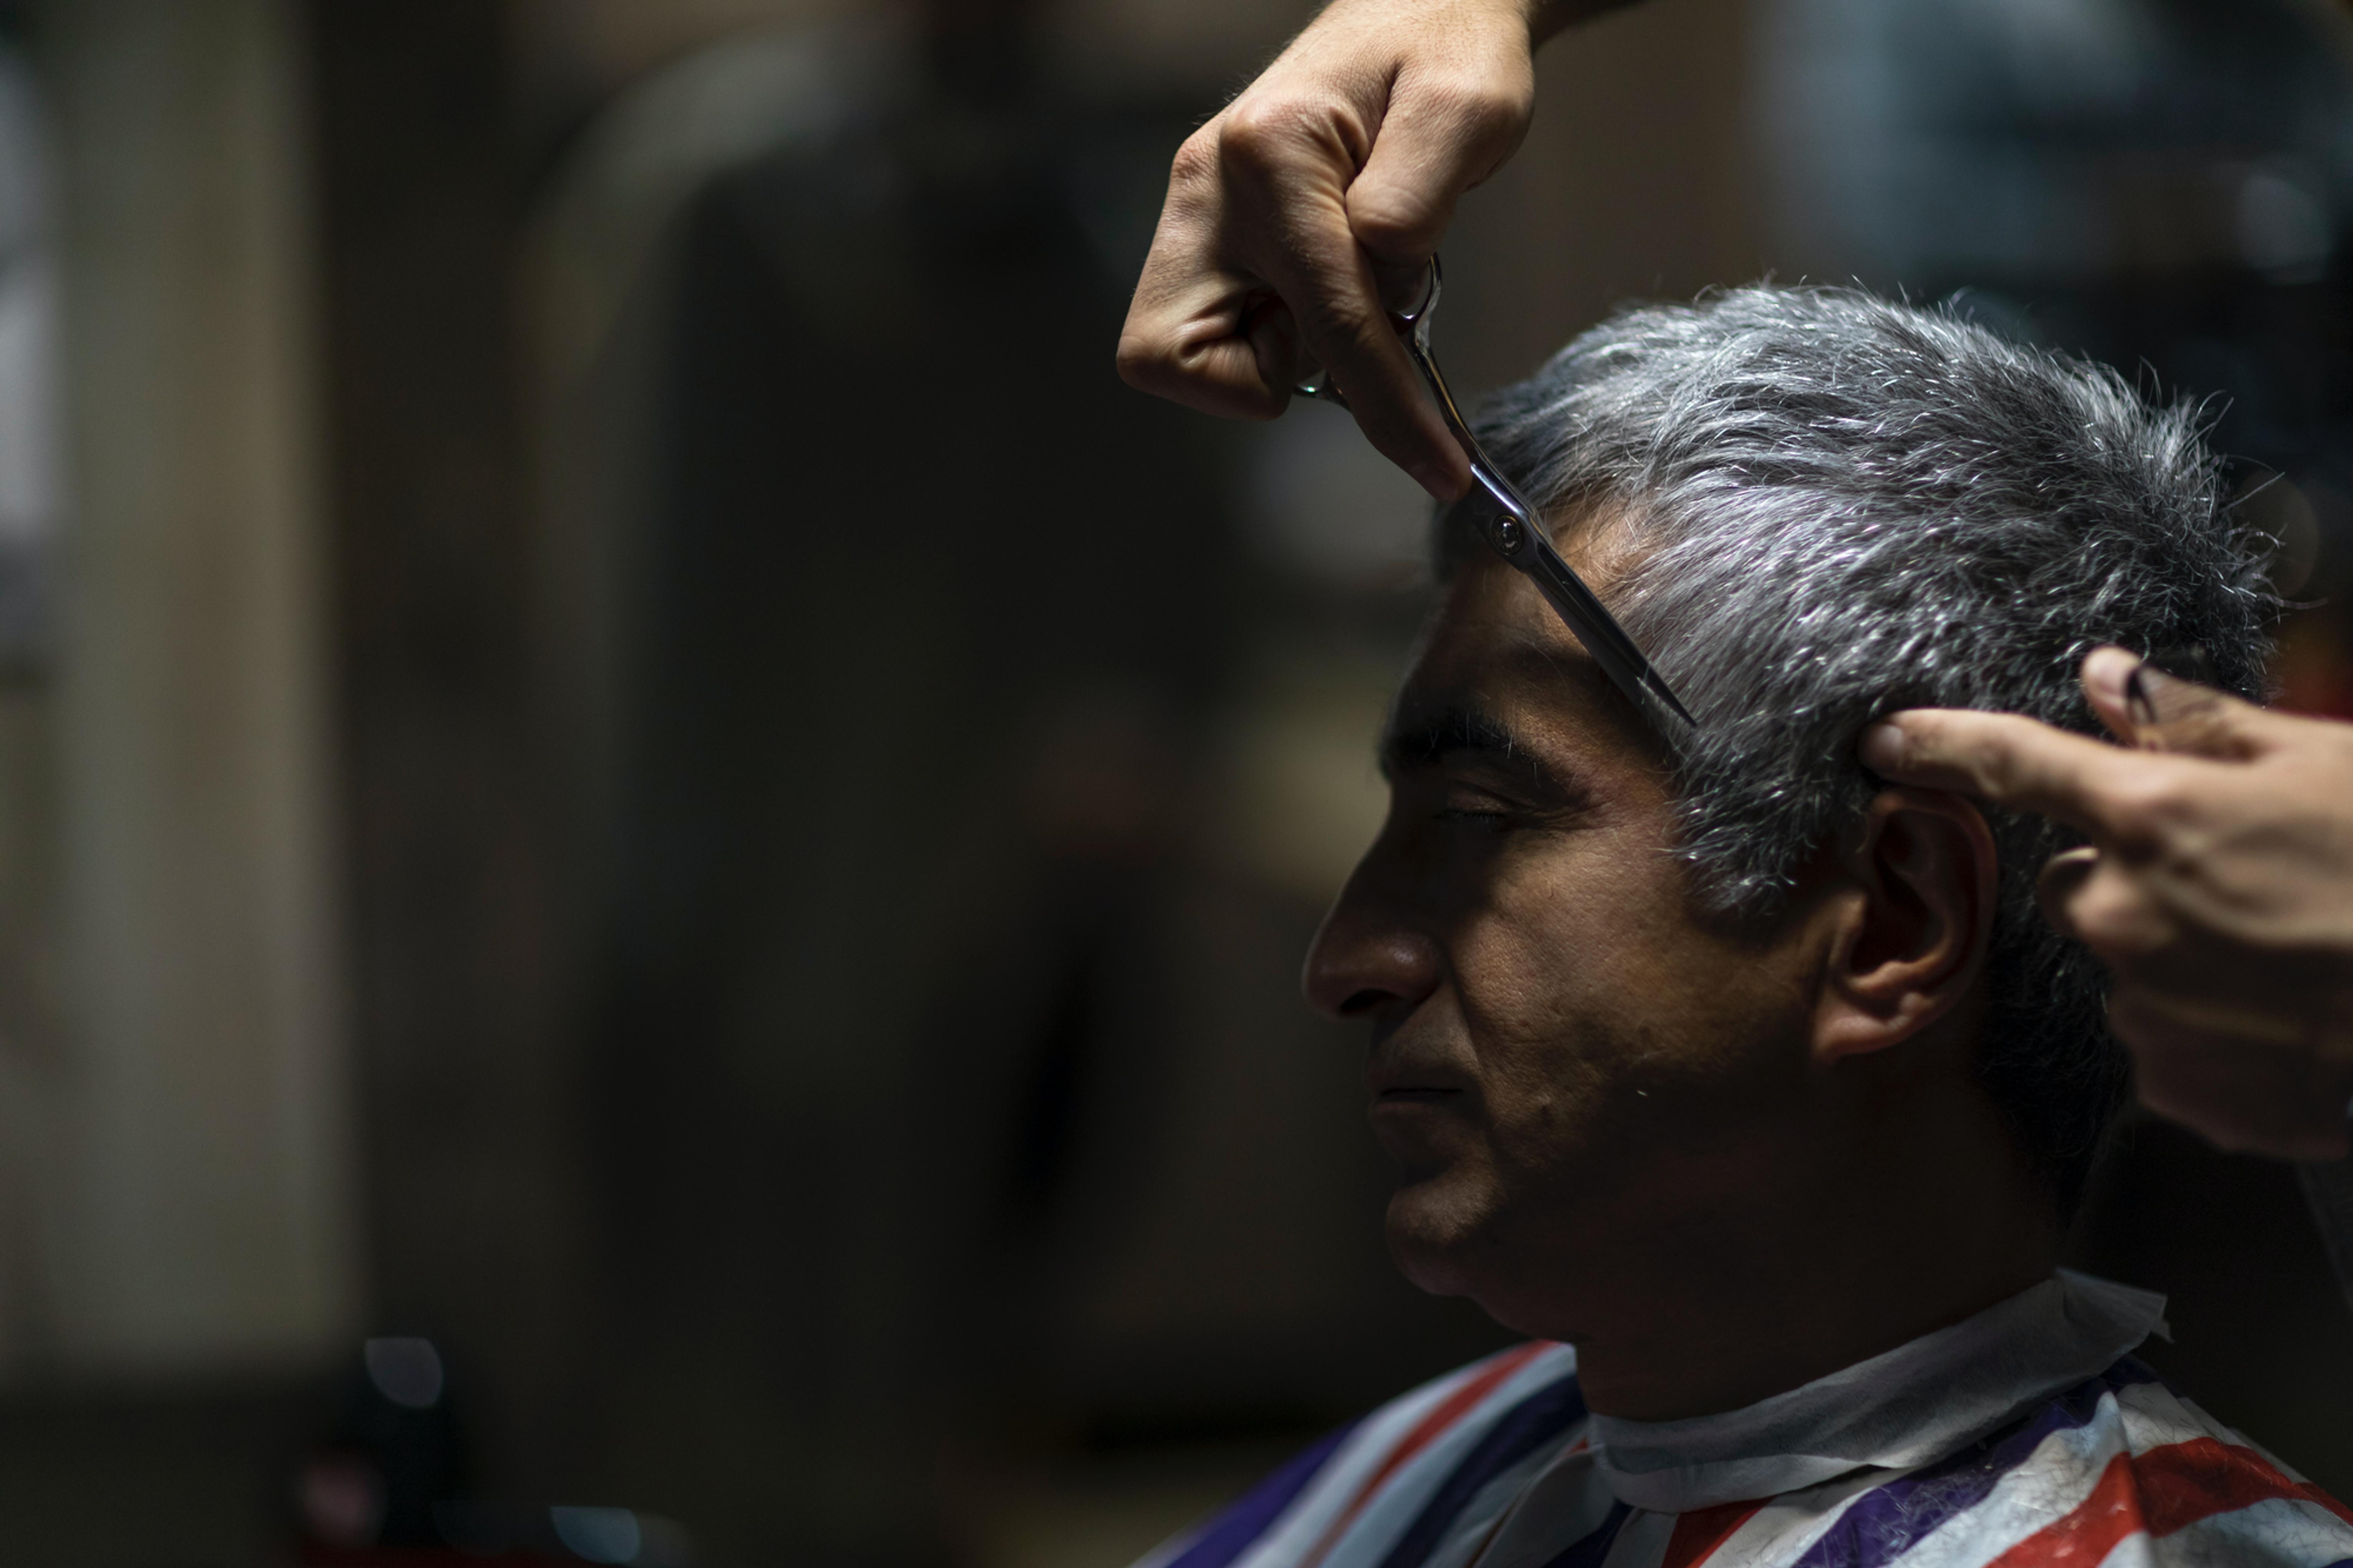 Senior Haircut In Matteson